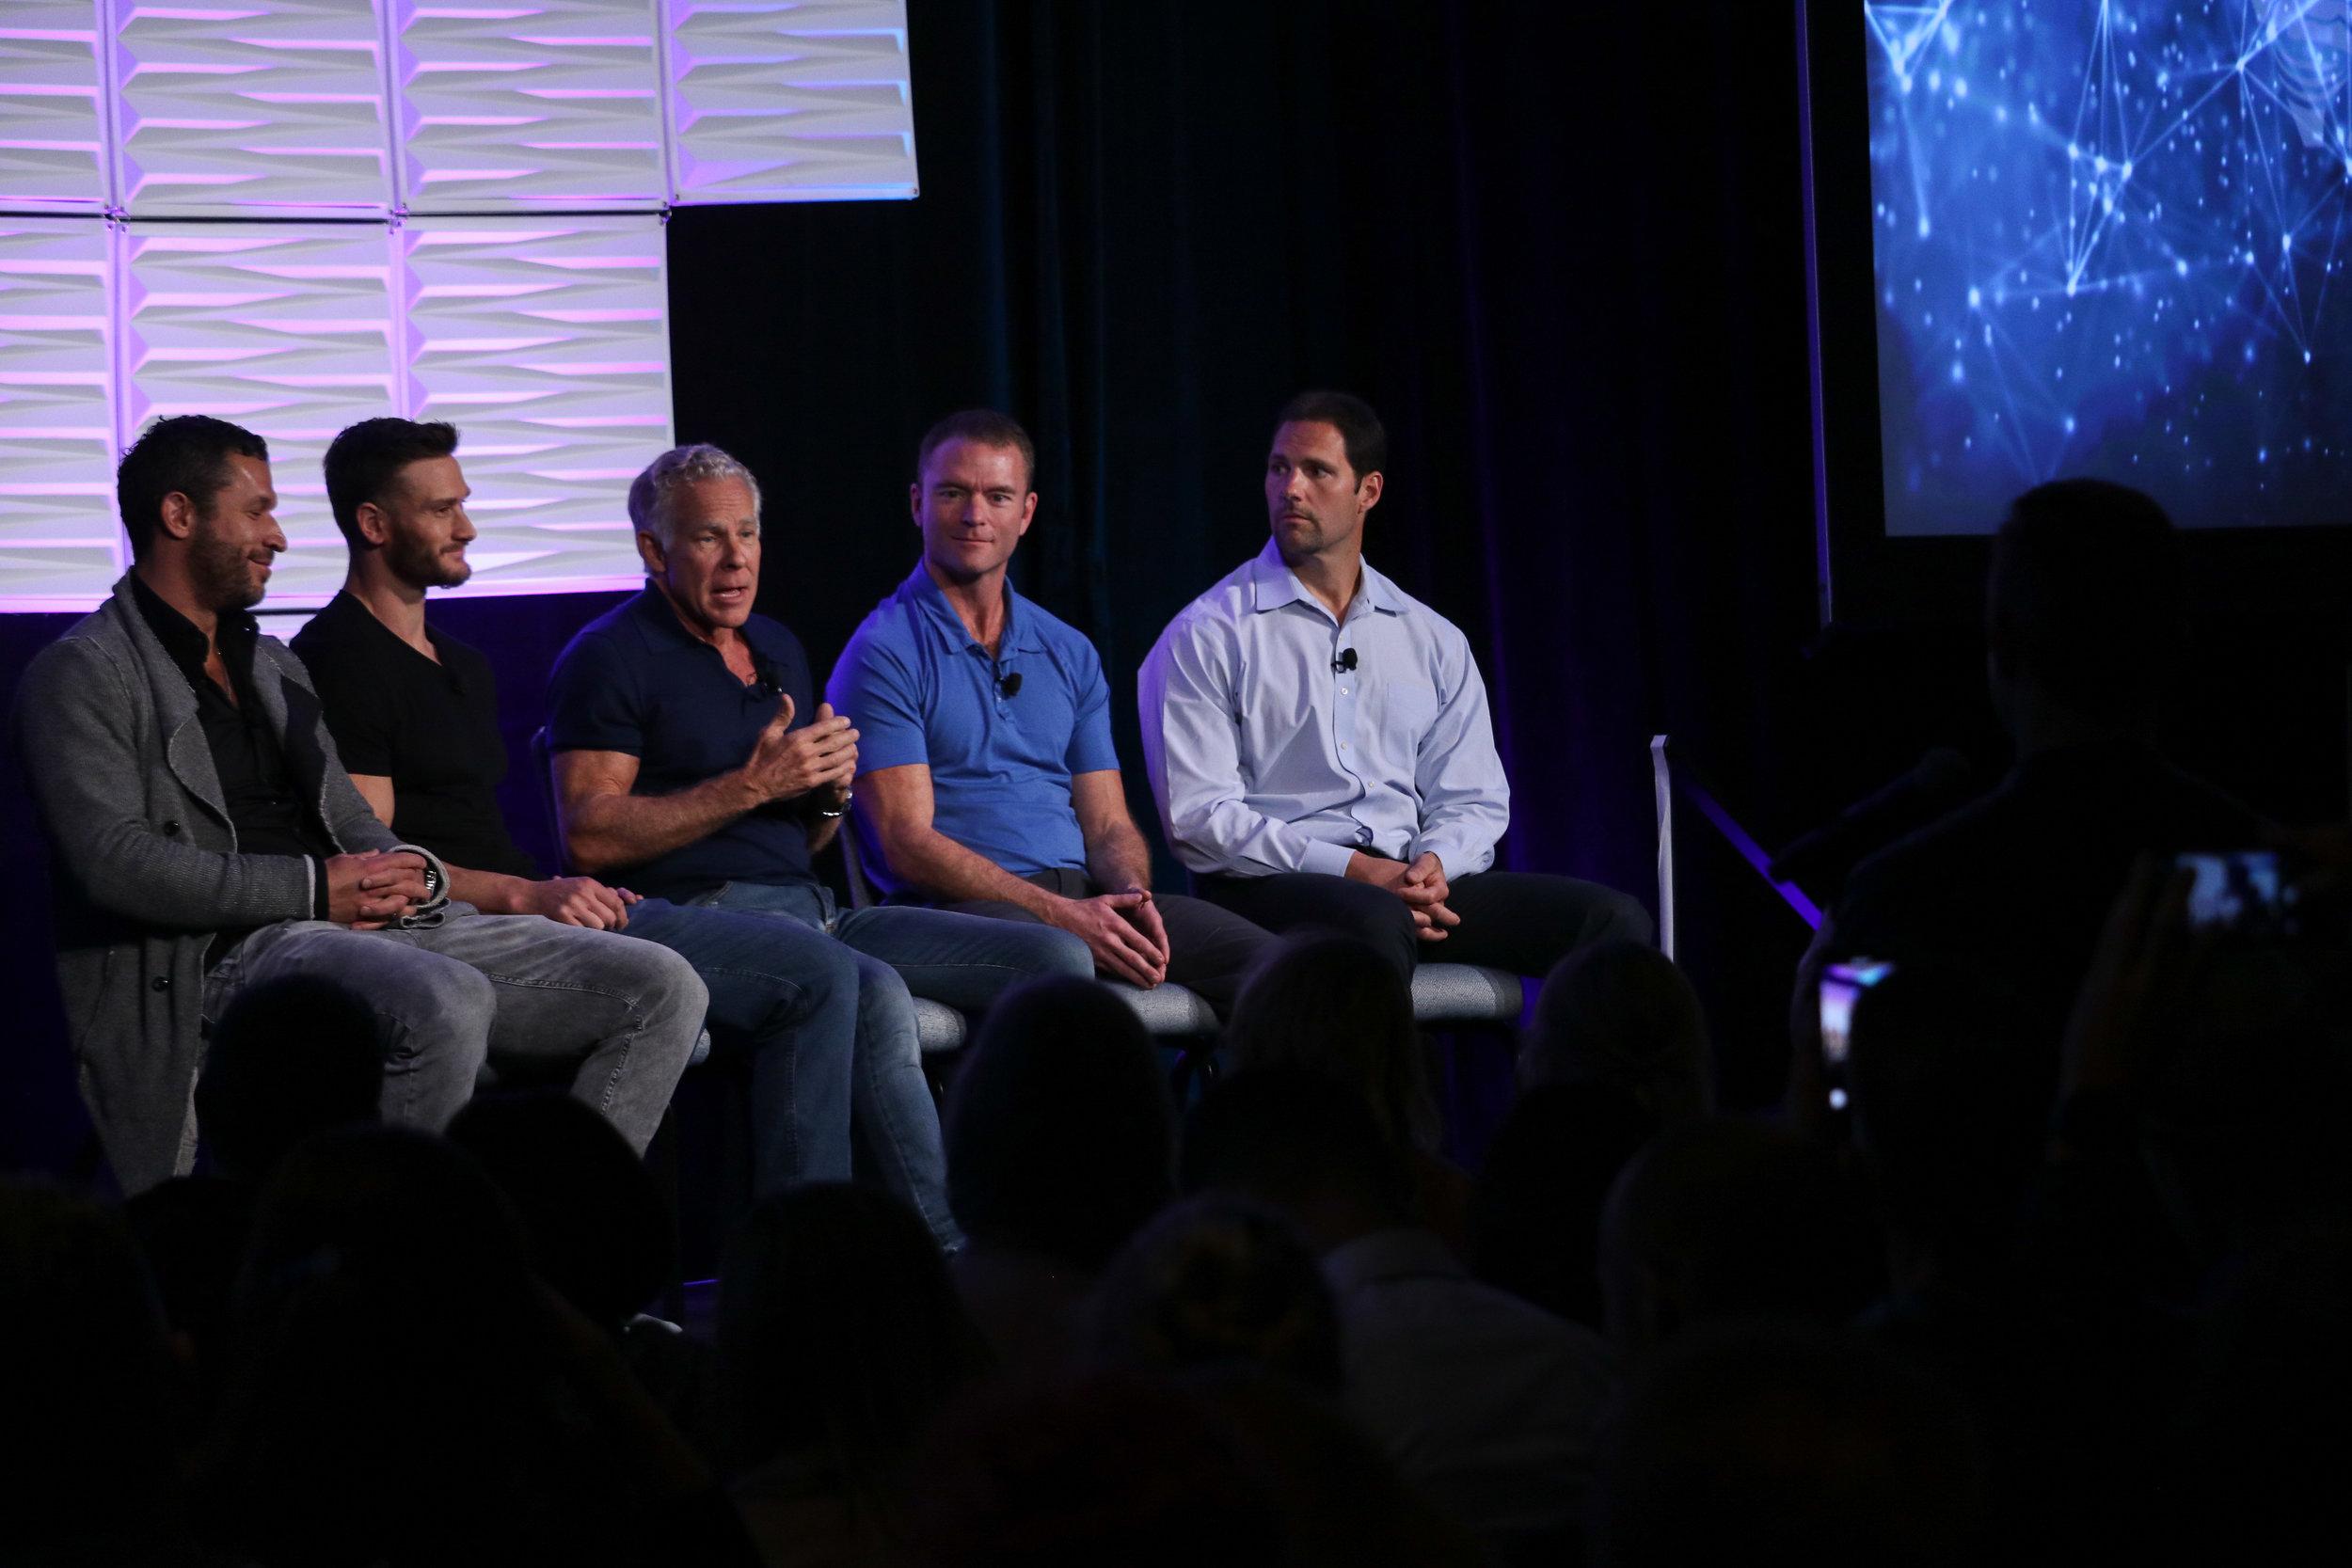 Panel discussion on human optimization